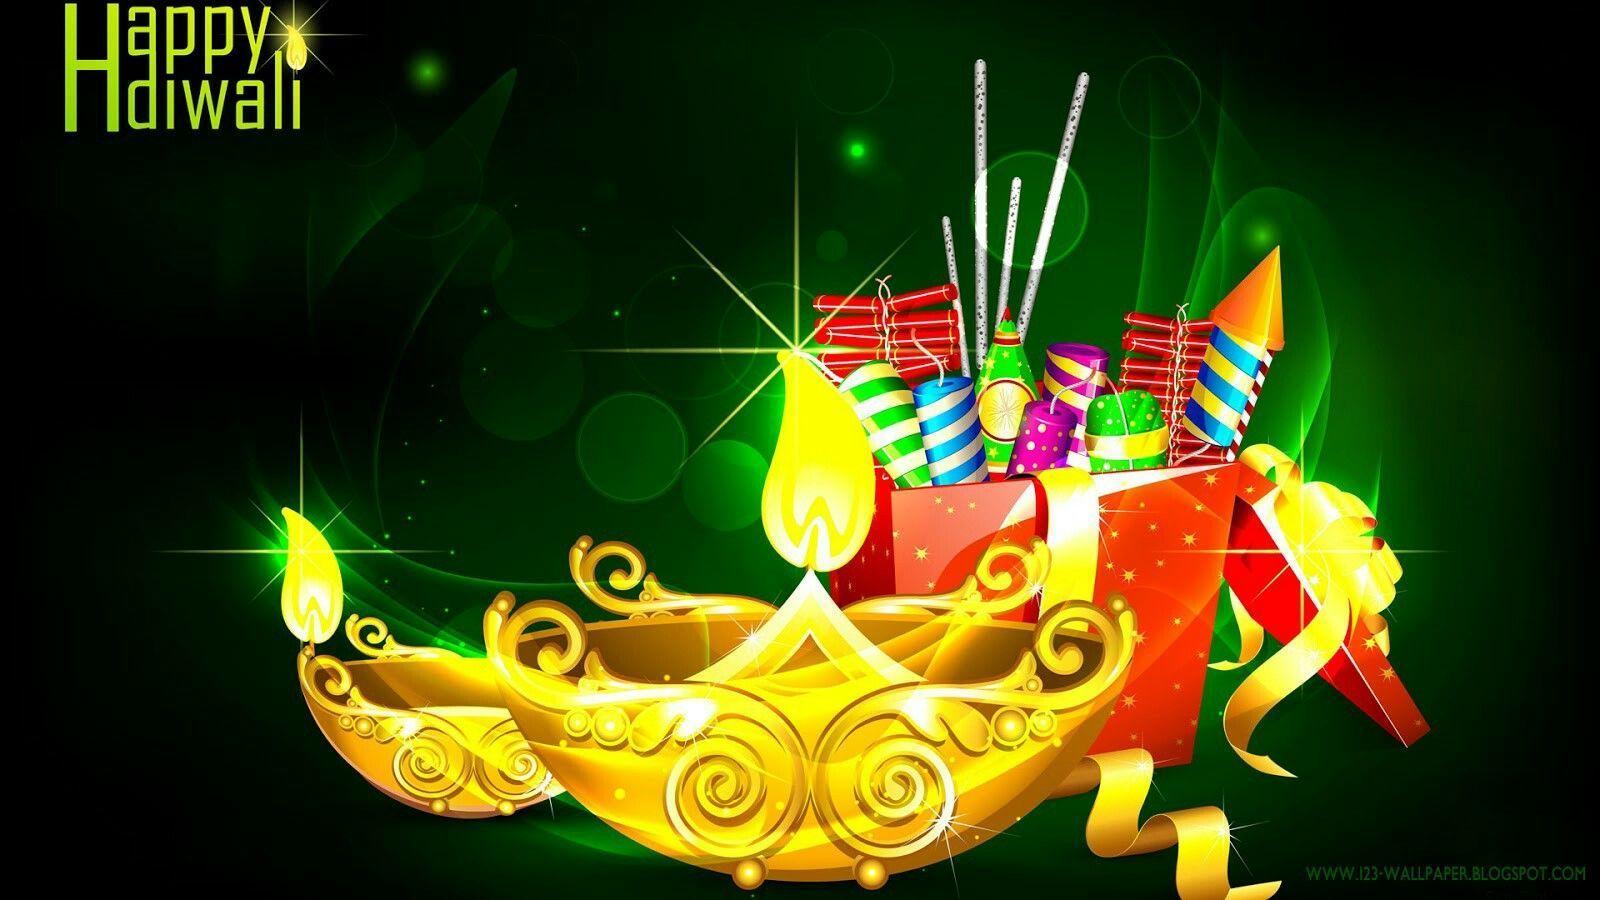 Happy Diwali, Festival of light  #happydiwaligreetings Happy Diwali, Diwali wallpapers, Diwali images, Diwali Greetings, Diwali pics, festival of light, Happy Diwali 2019, Happy Diwali festival card, Happy Deepawali, Happy Deepavali, Happy Diwali quotes #happydiwaligreetings Happy Diwali, Festival of light  #happydiwaligreetings Happy Diwali, Diwali wallpapers, Diwali images, Diwali Greetings, Diwali pics, festival of light, Happy Diwali 2019, Happy Diwali festival card, Happy Deepawali, Happy D #happydiwaligreetings